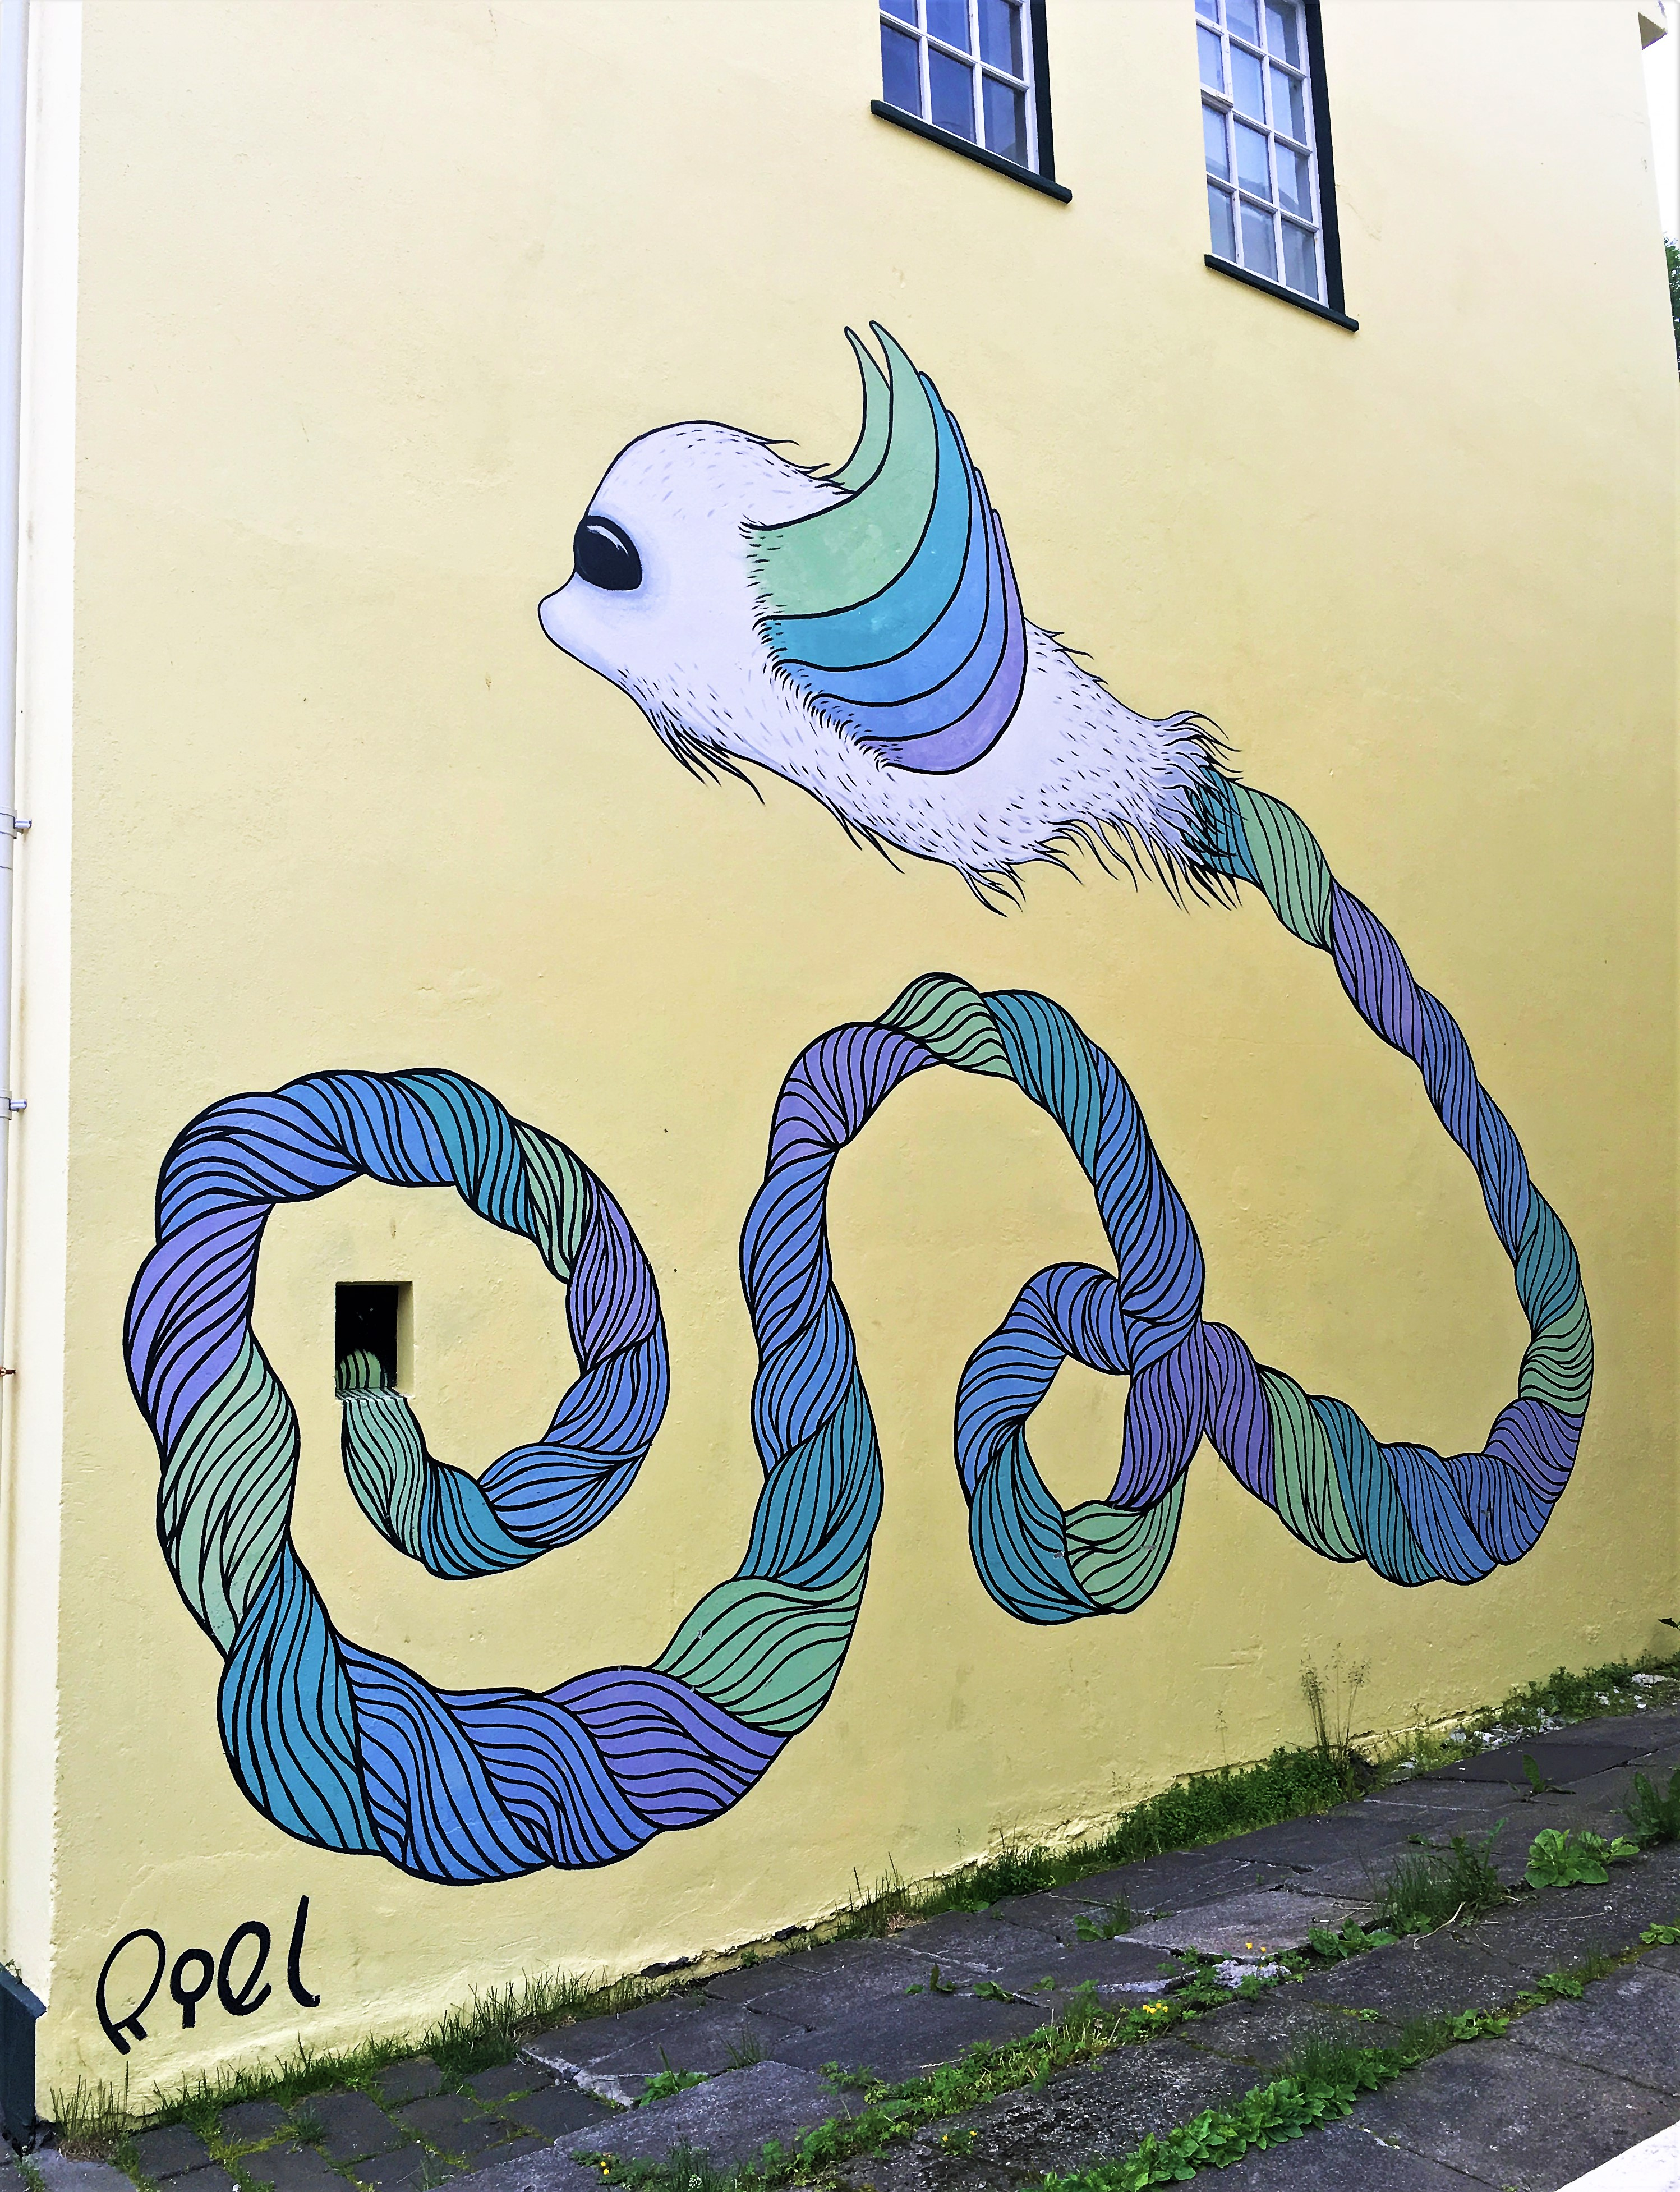 Graffiti and Street Art in Reykjavík   Guide to Iceland